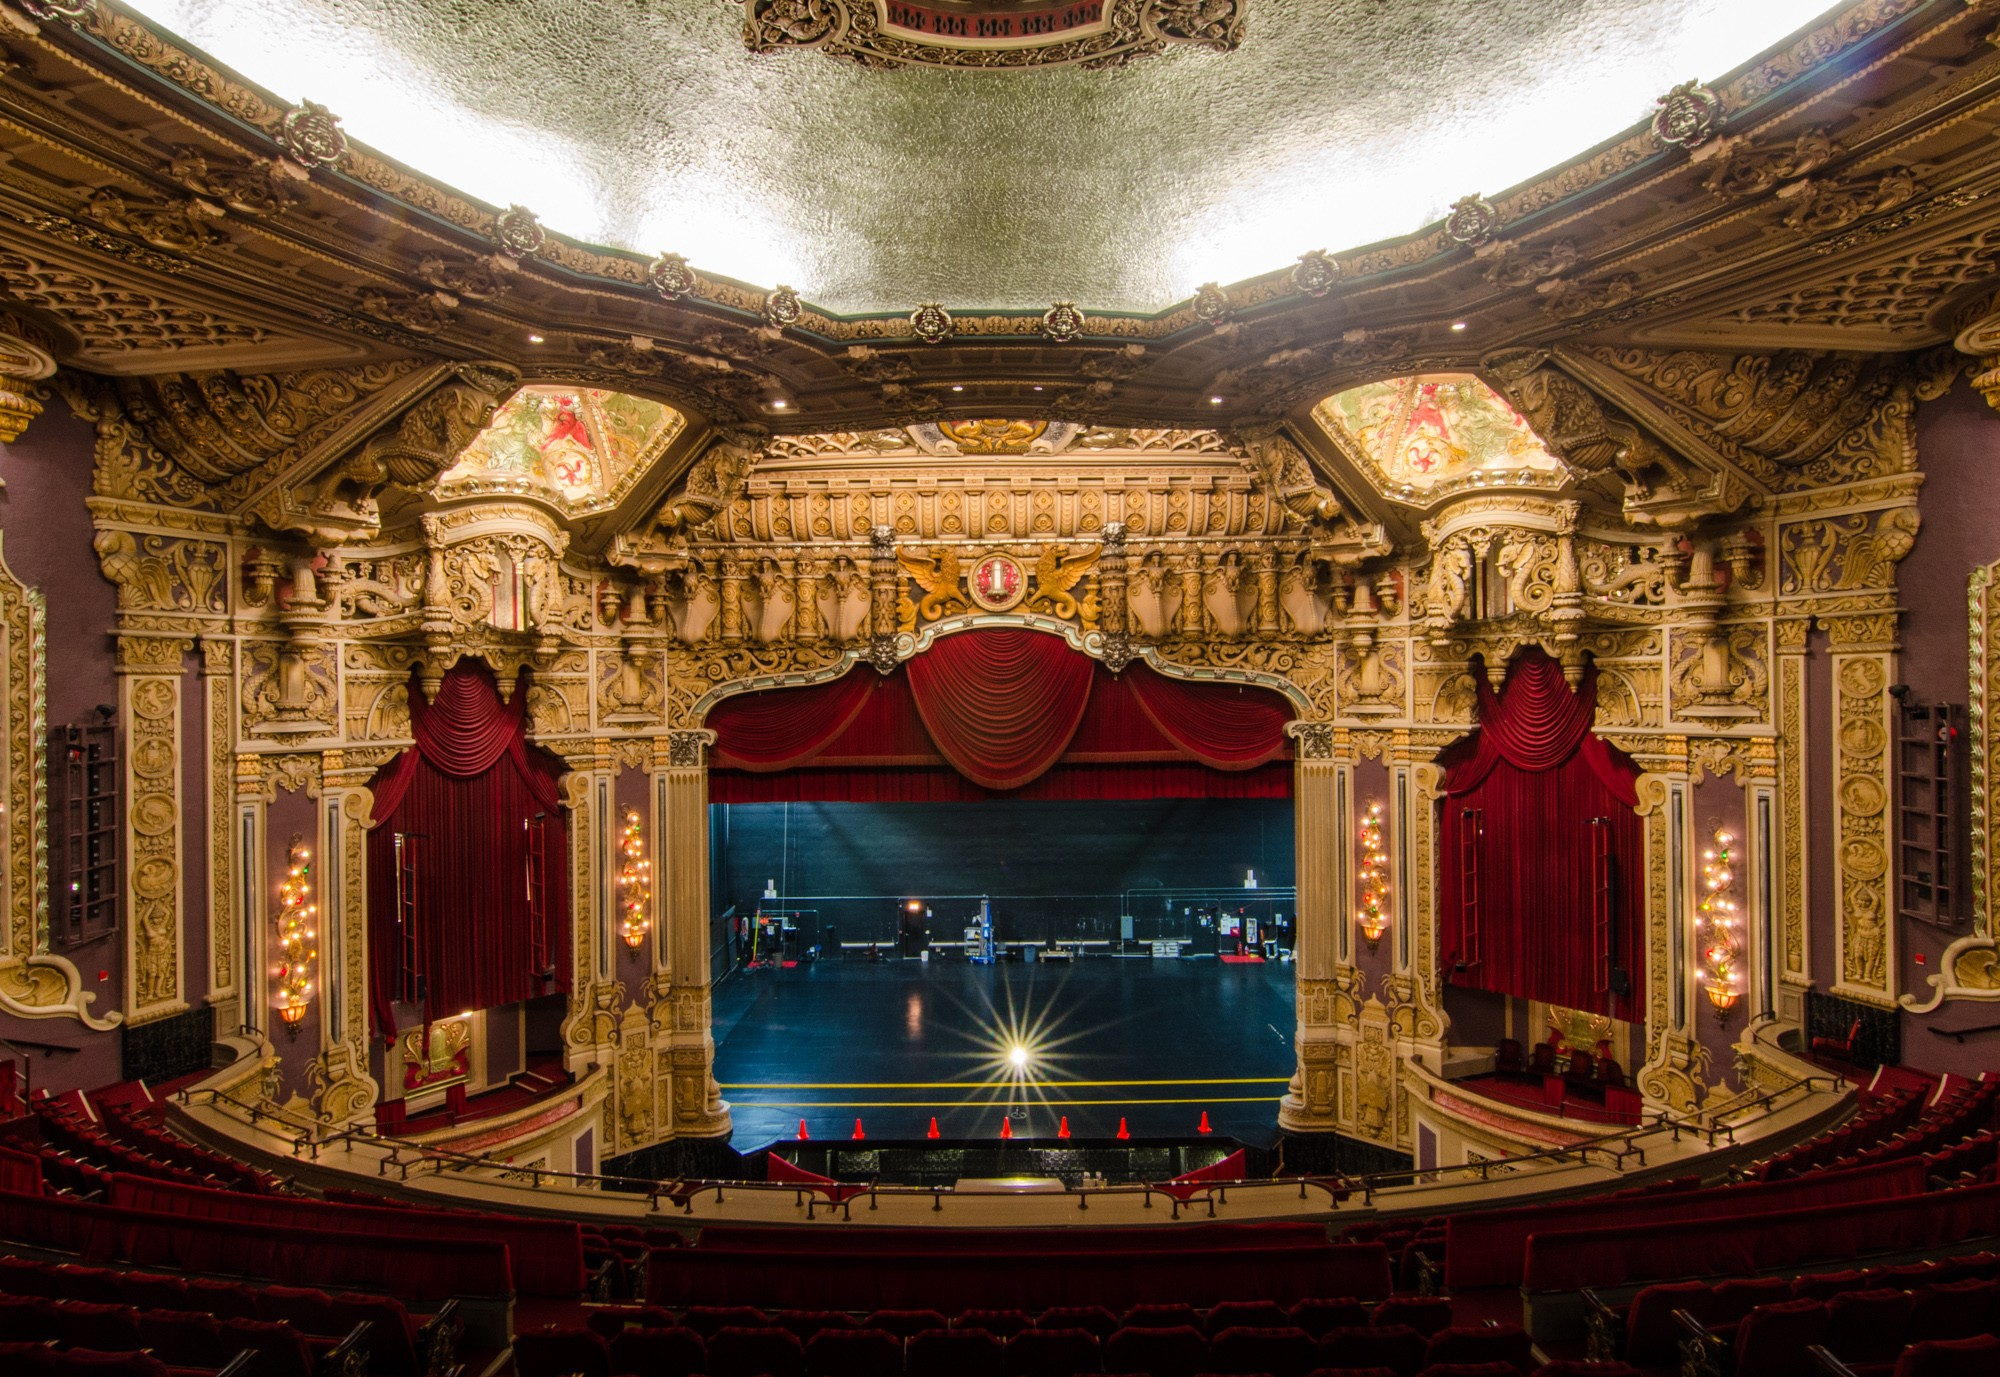 oriental-theatre-eric-allix-rogers-08.jpg